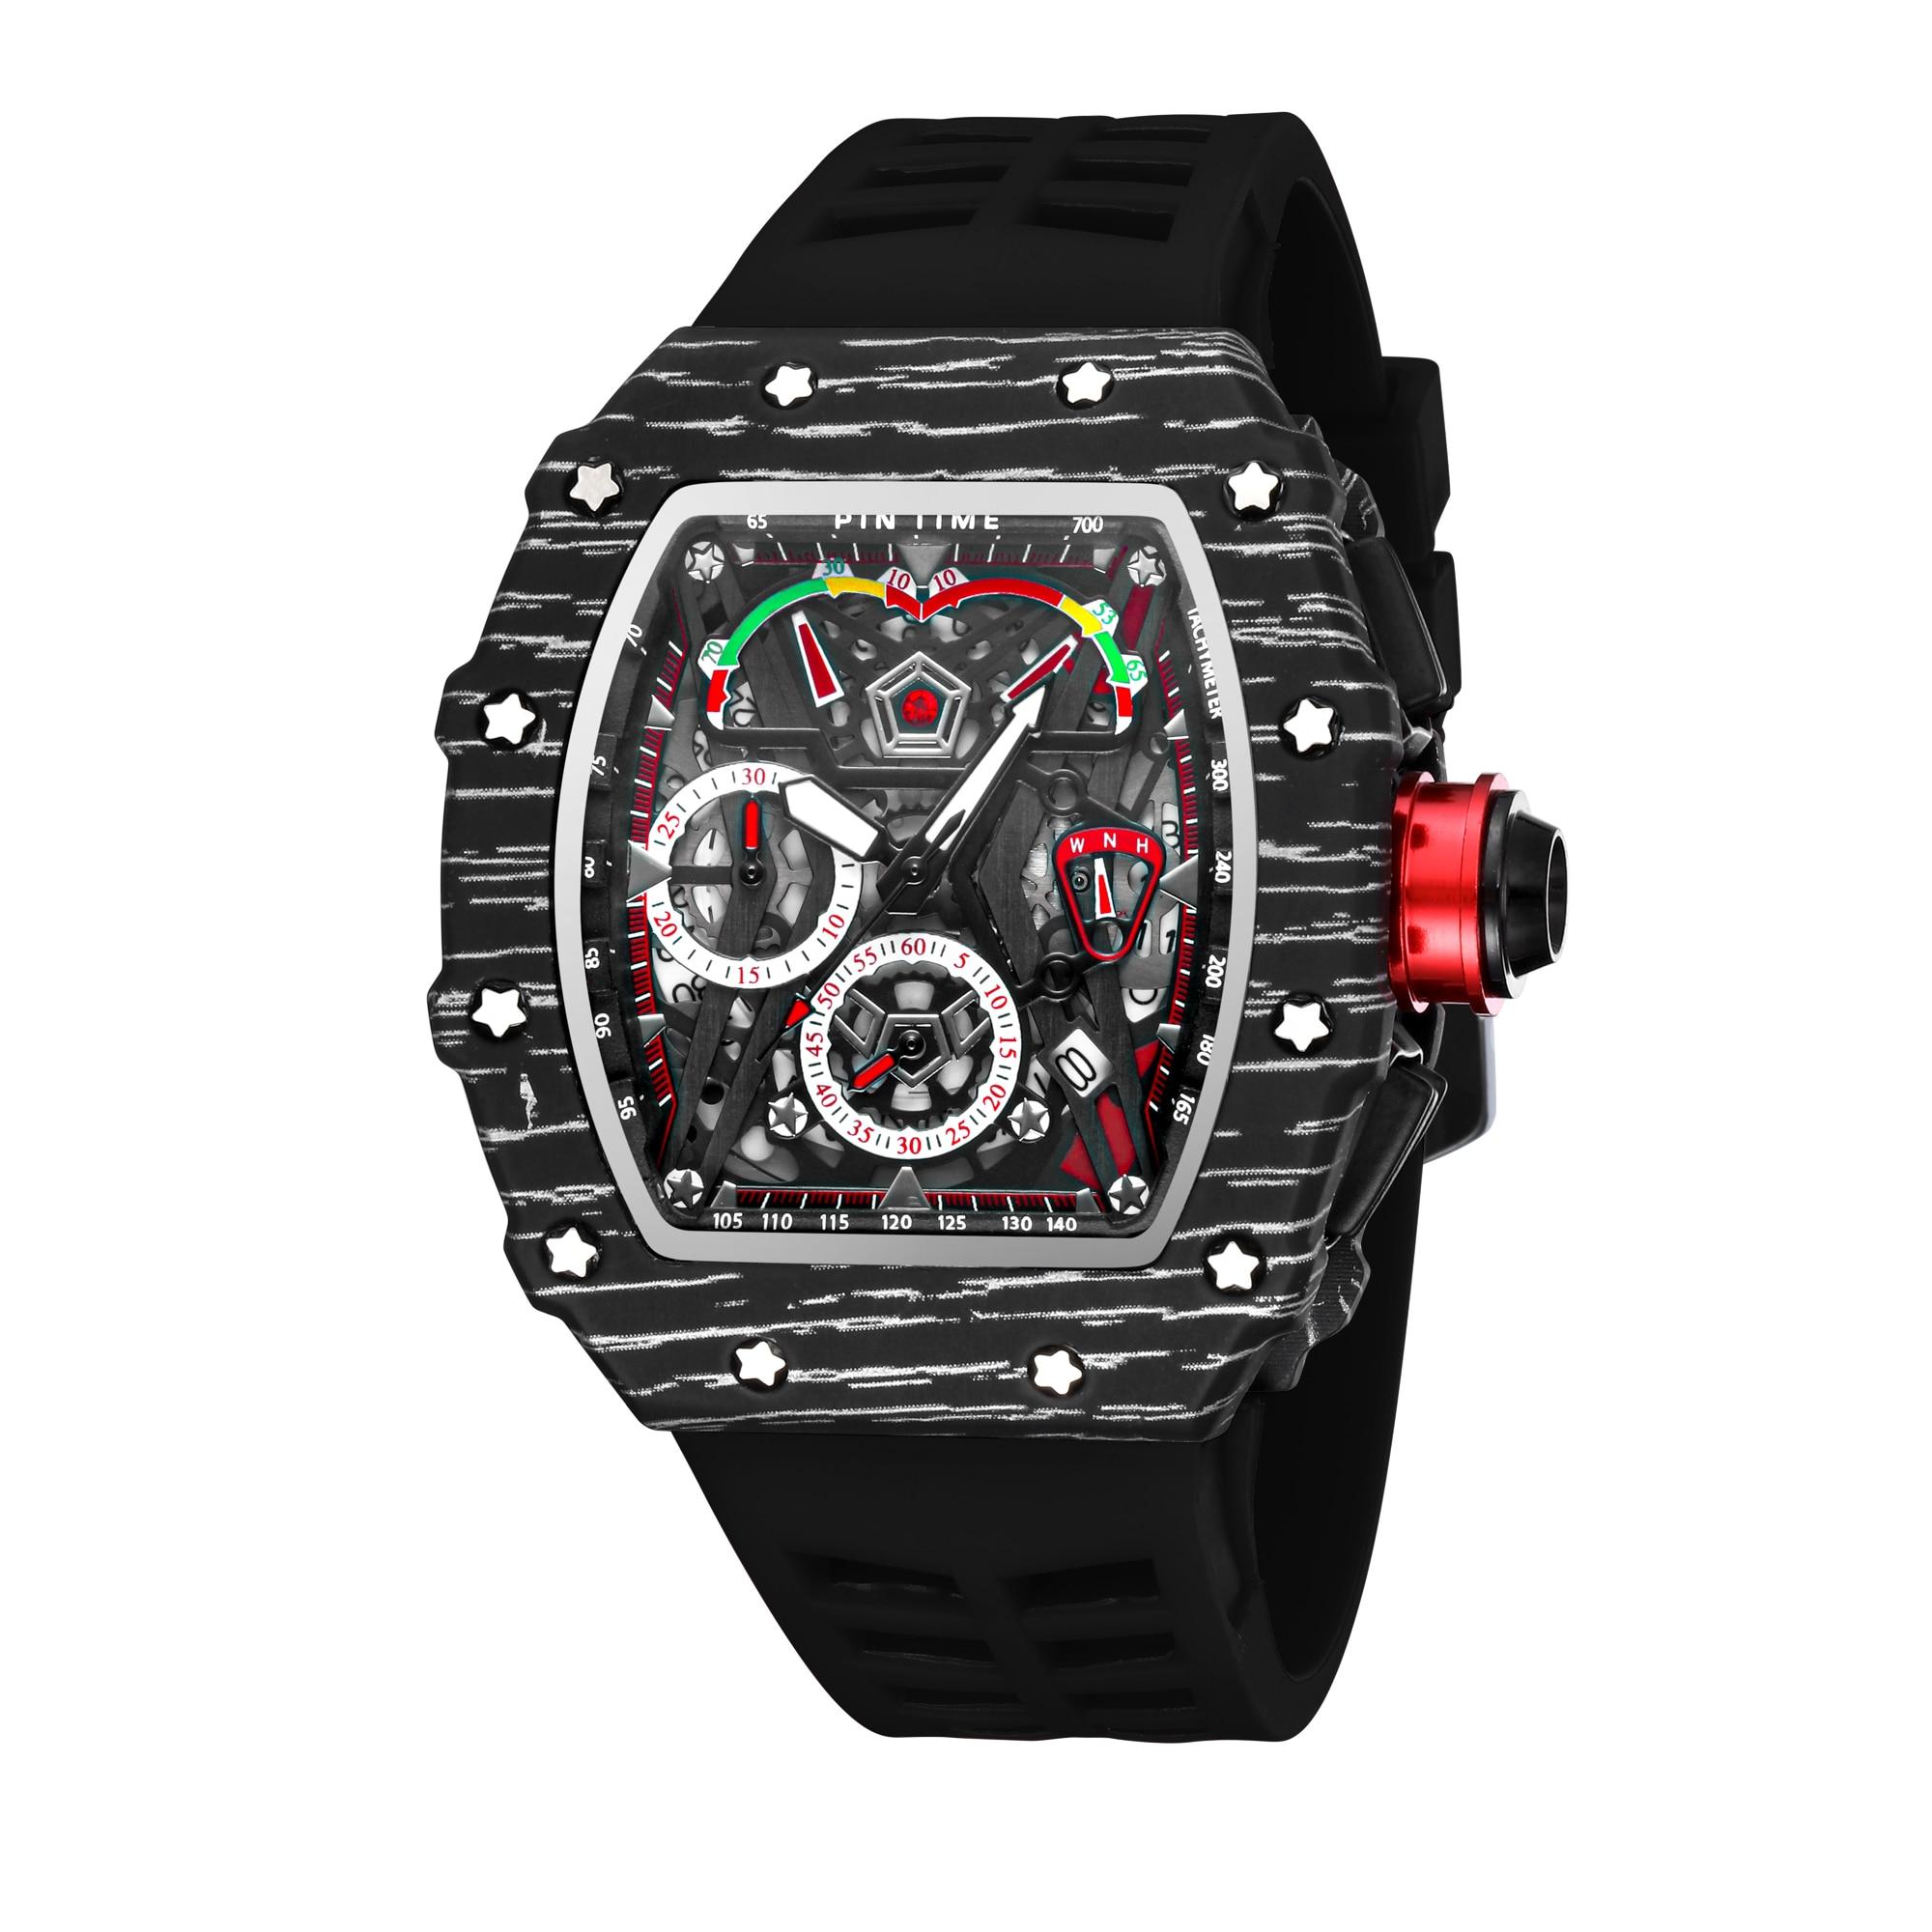 New Men's WatchTonneau Watches Men's Big Dial Quartz Watch Multifunctional MillerMiller Luminous Calendar Silicone WristWatch